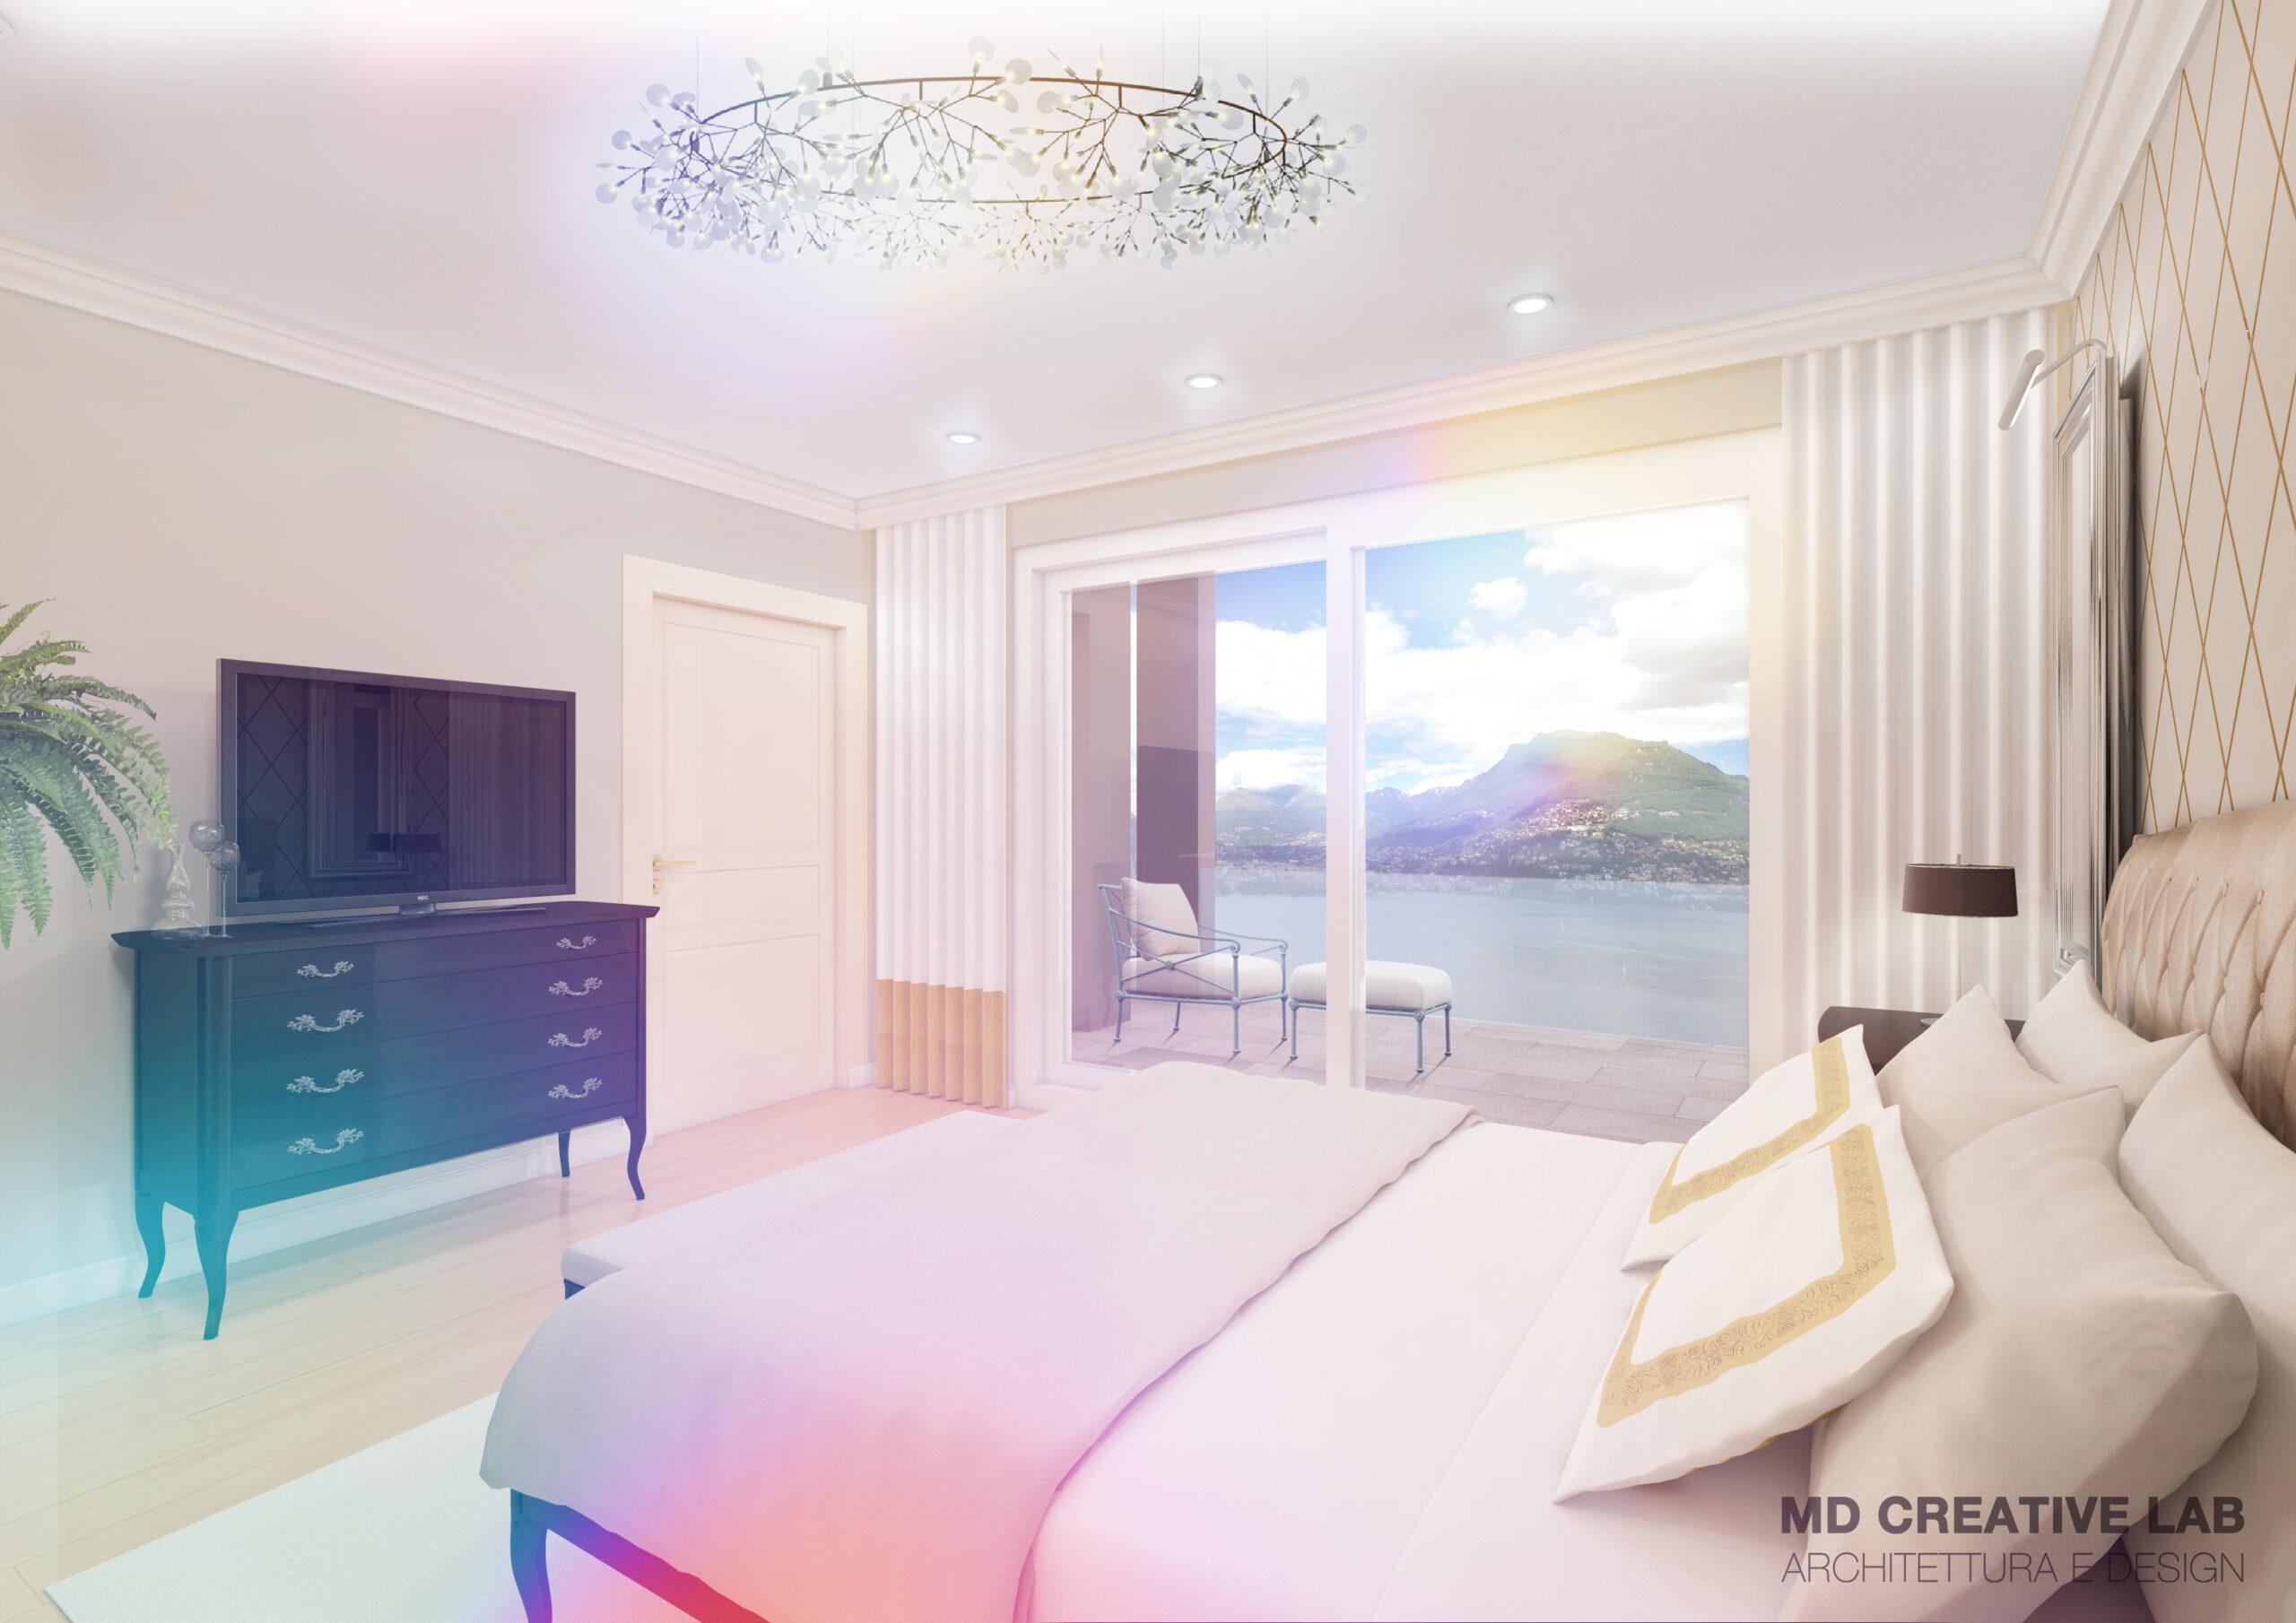 MD Creative Lab Lugano  Bedroom Design Lugano Paradiso  Emerald Living Residnece scaled